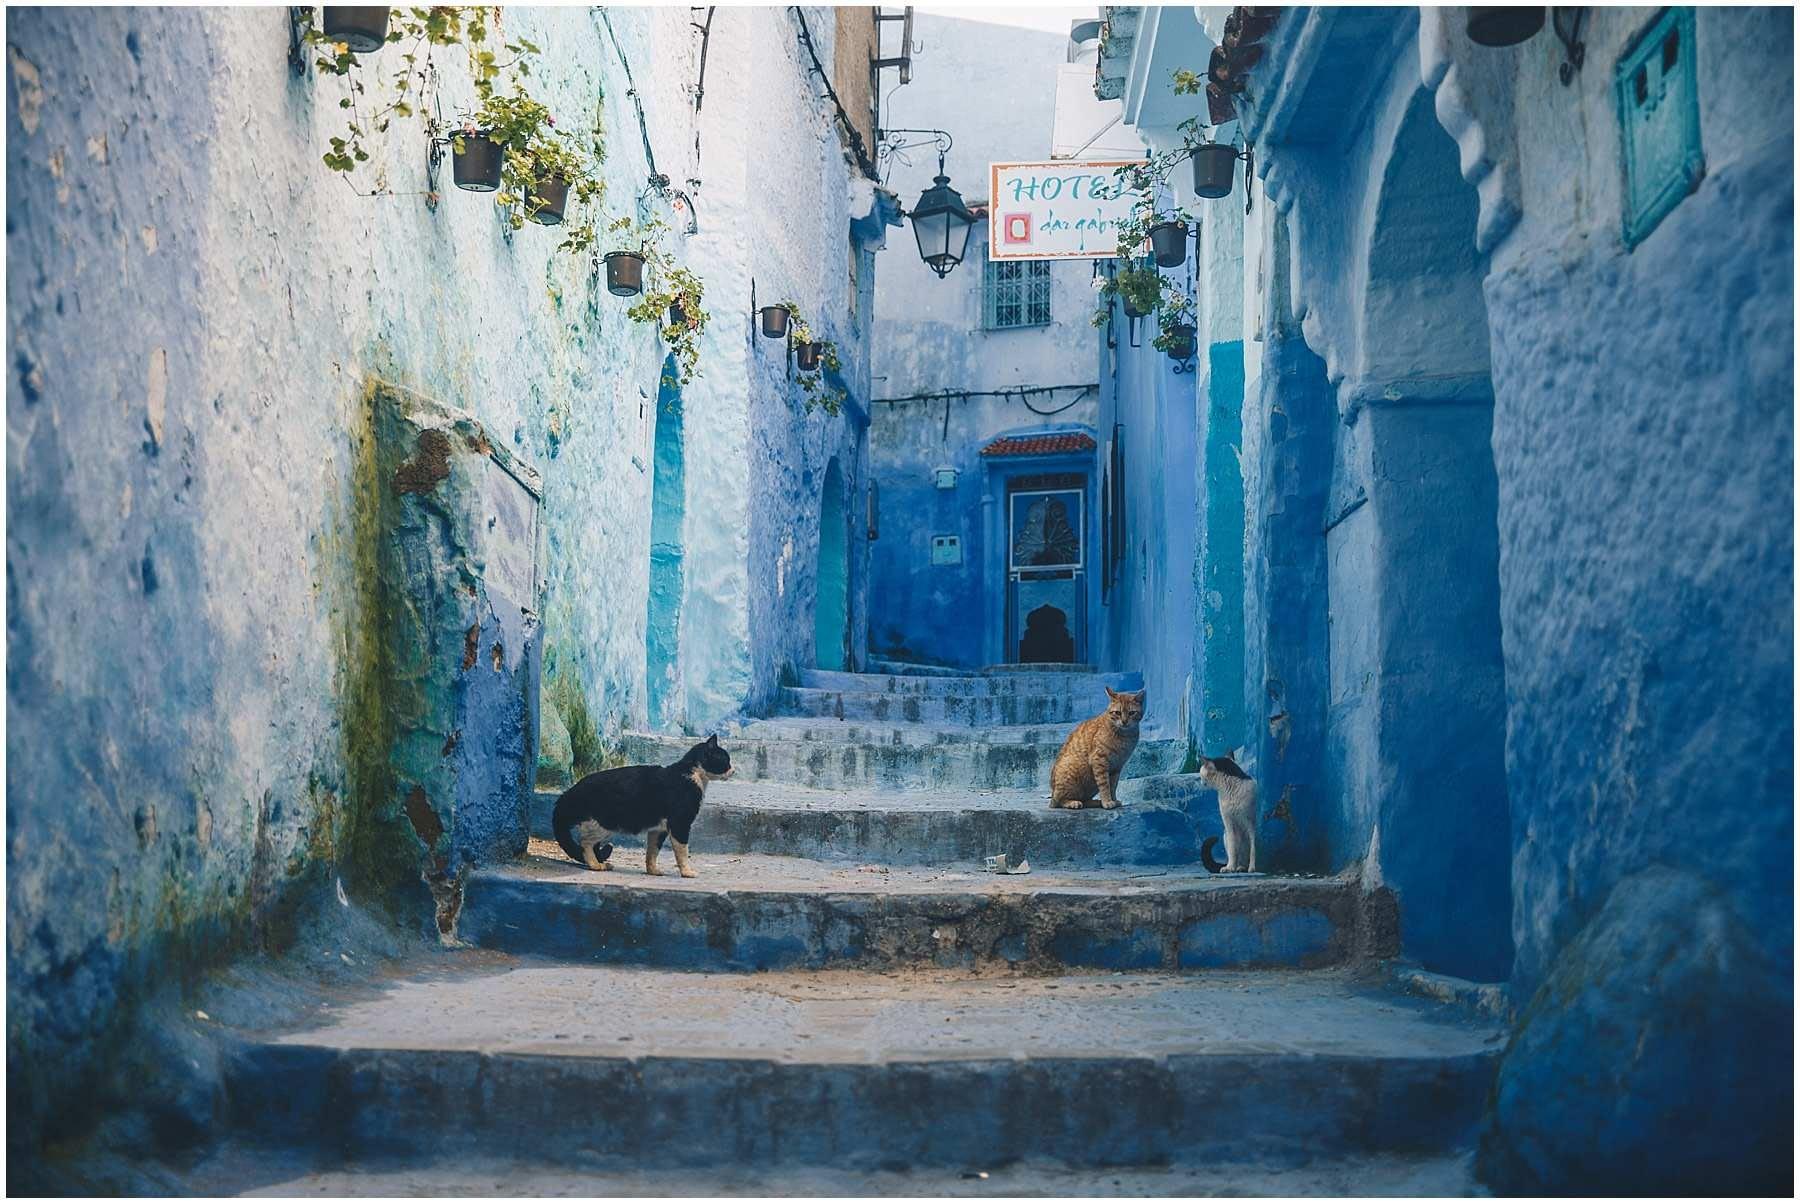 Morocco Chefchaouen_0037.jpg